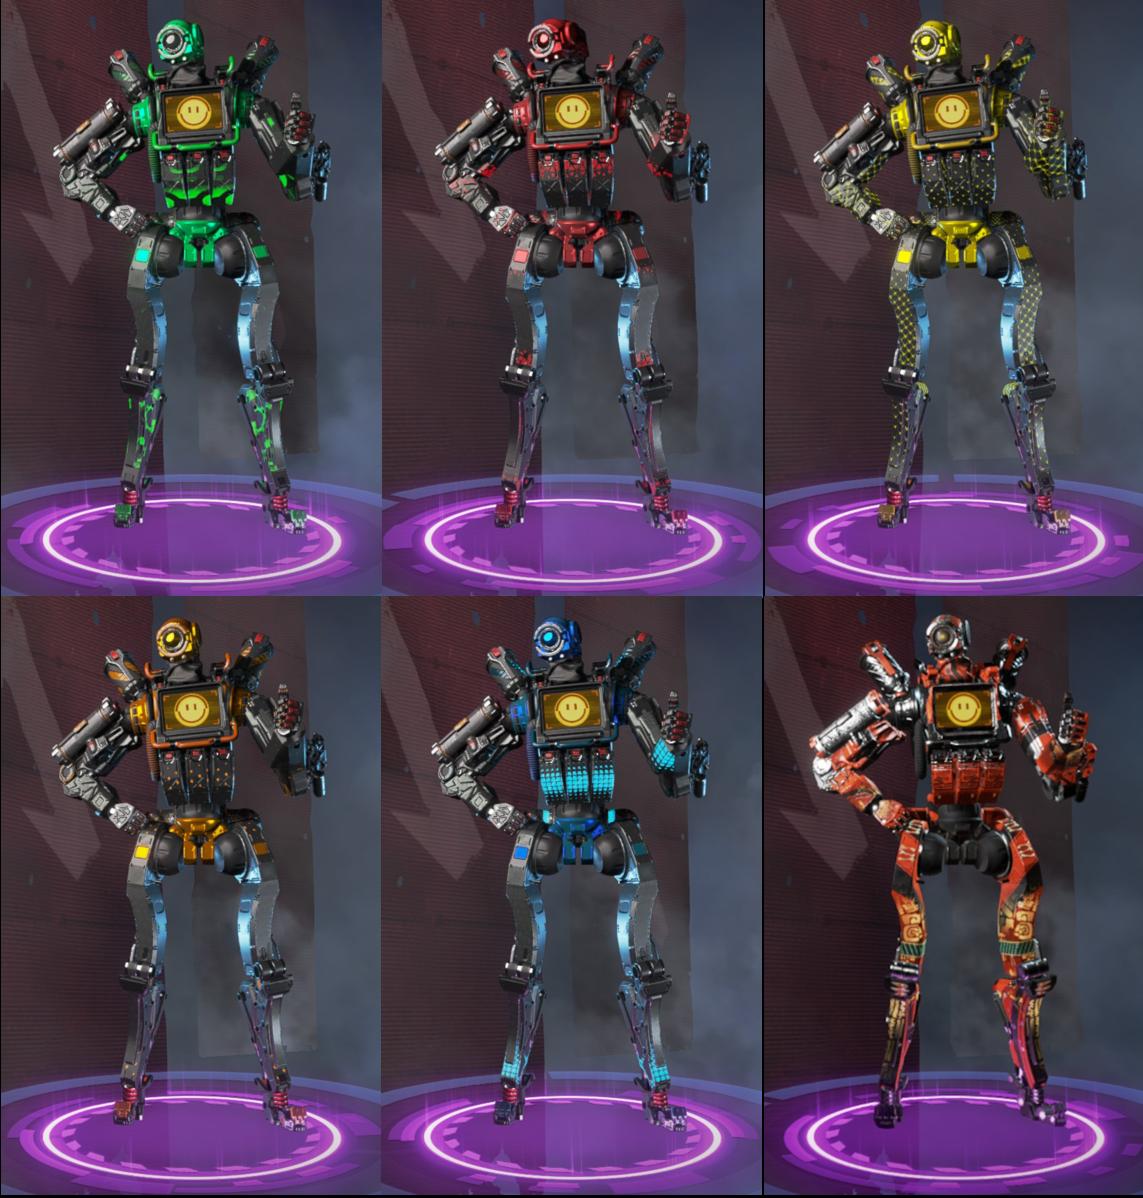 The Rarest Pathfinder Skins